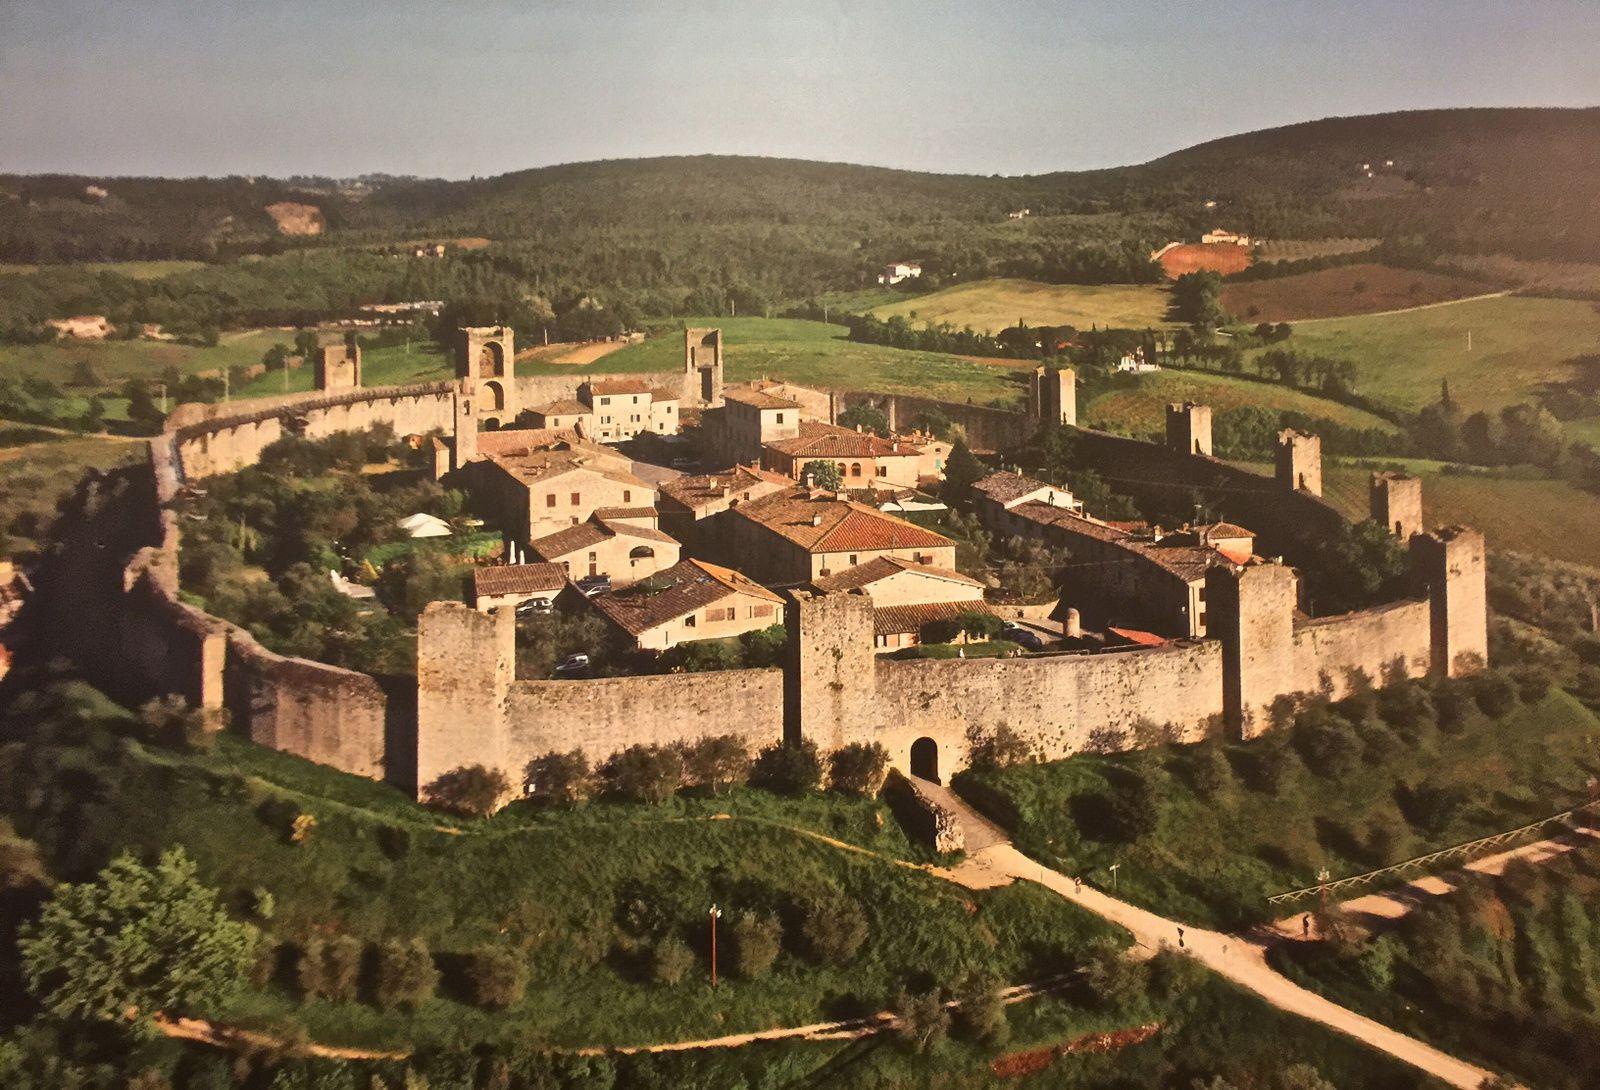 Toscane - Monteriggioni